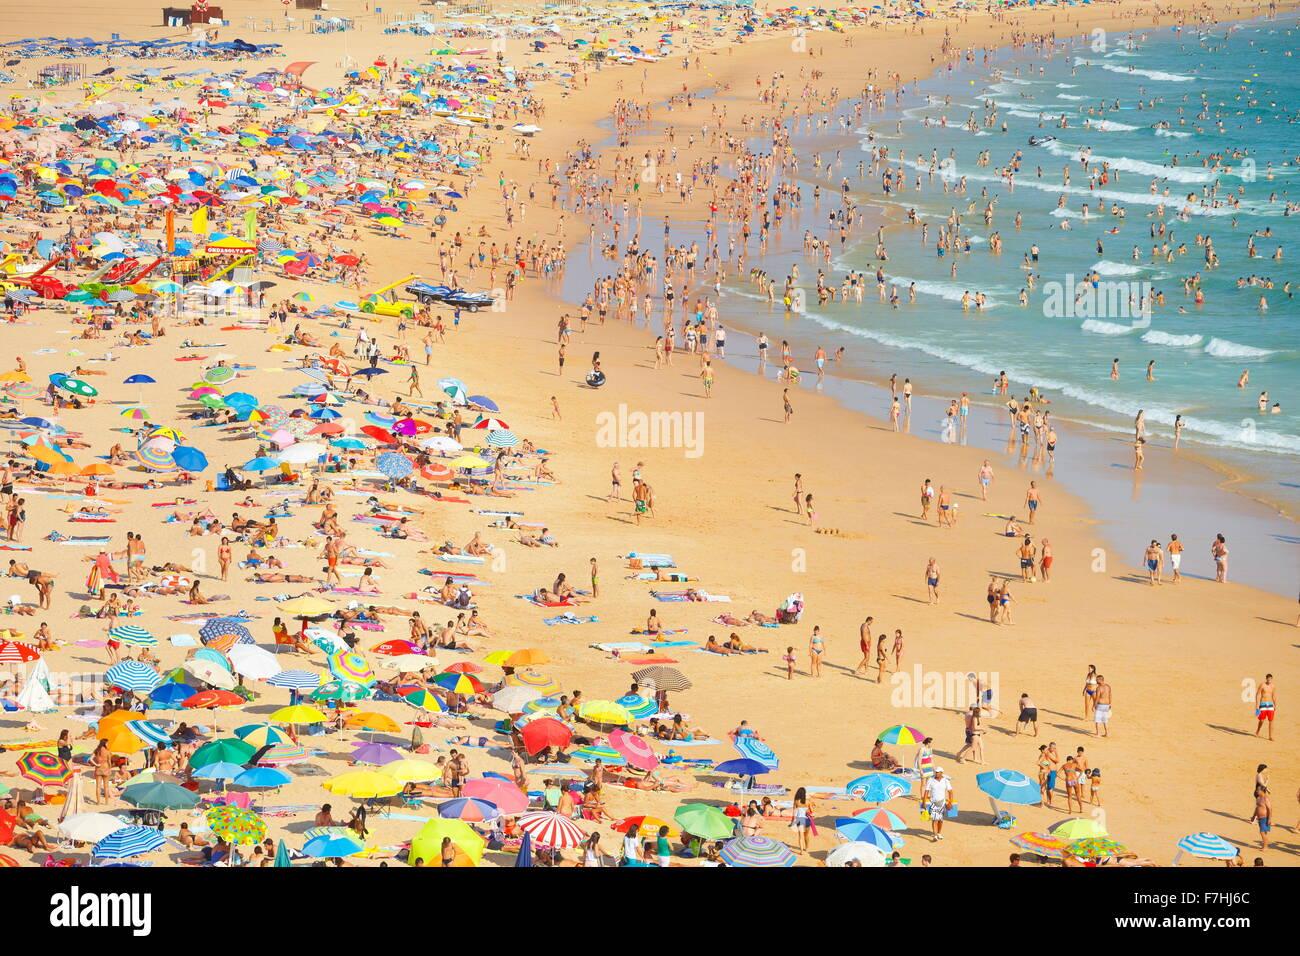 La playa de Rocha, Portimão, Algarve, Portugal Foto de stock